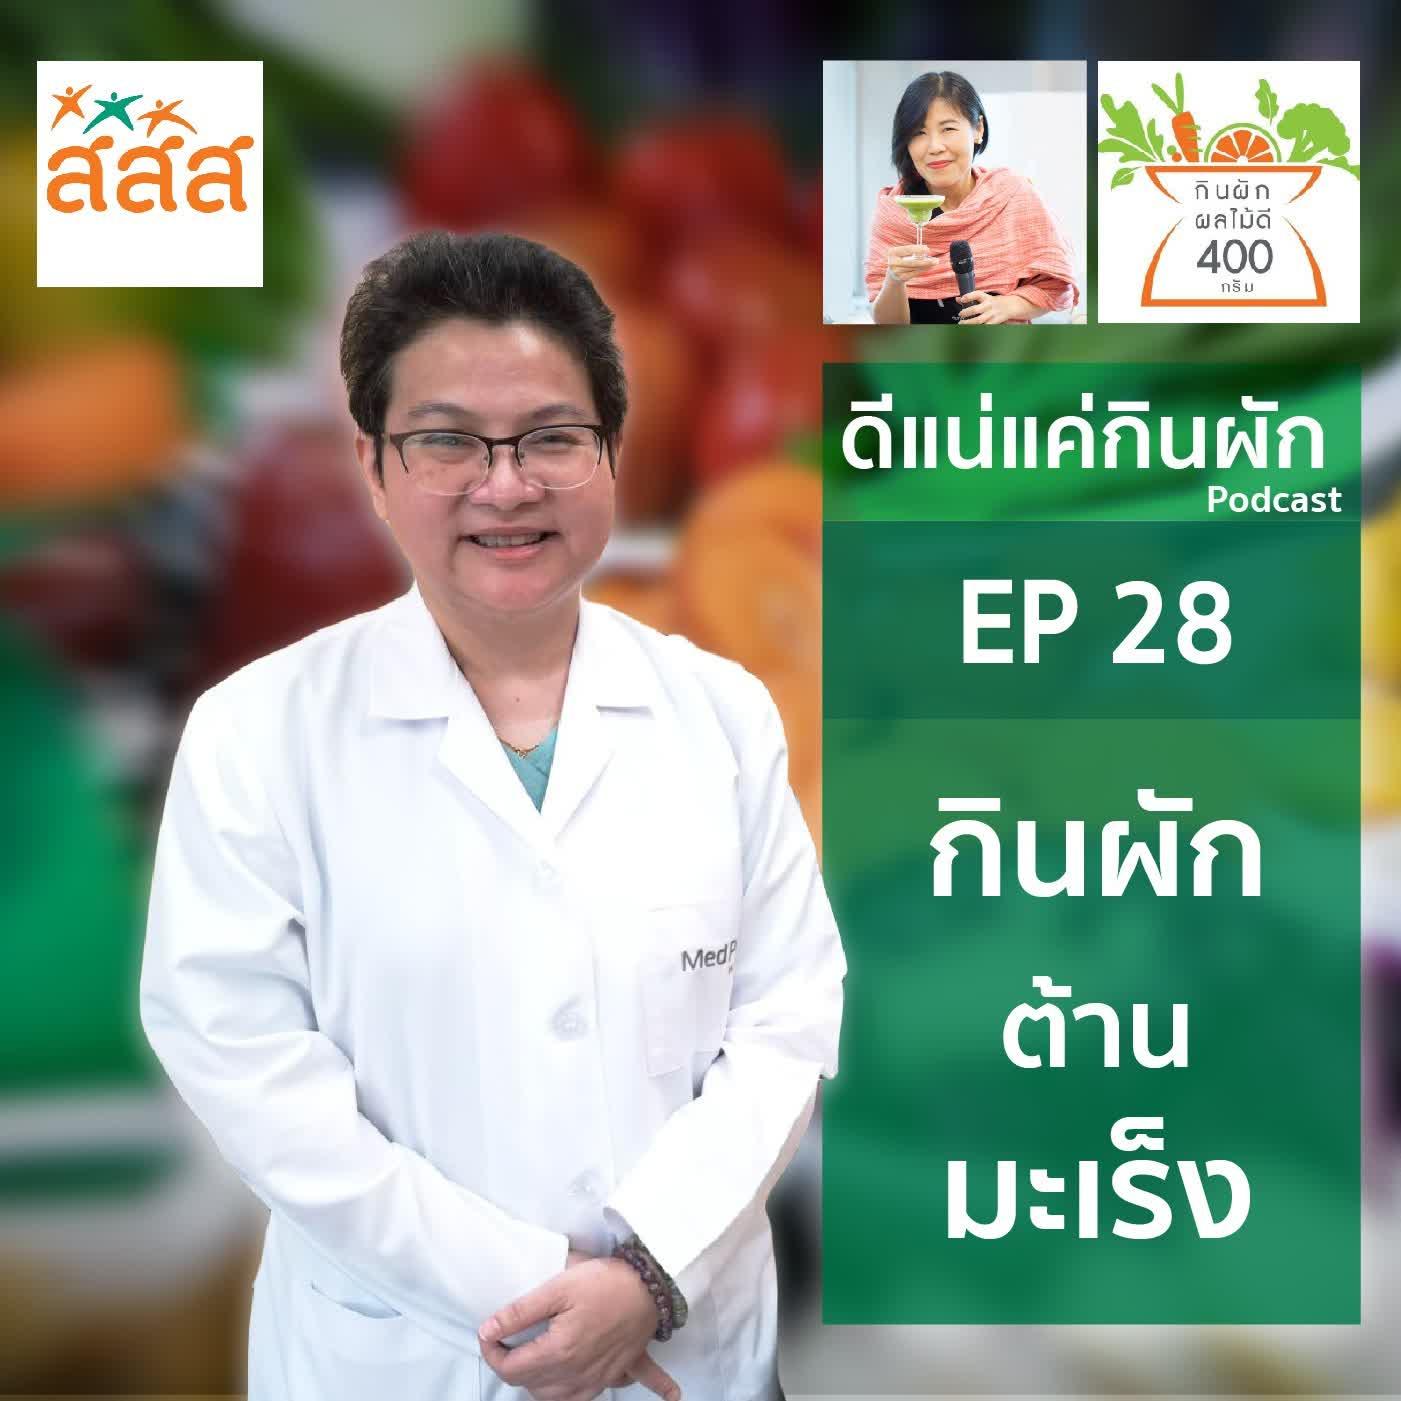 EP.028 กินผักต้านมะเร็ง